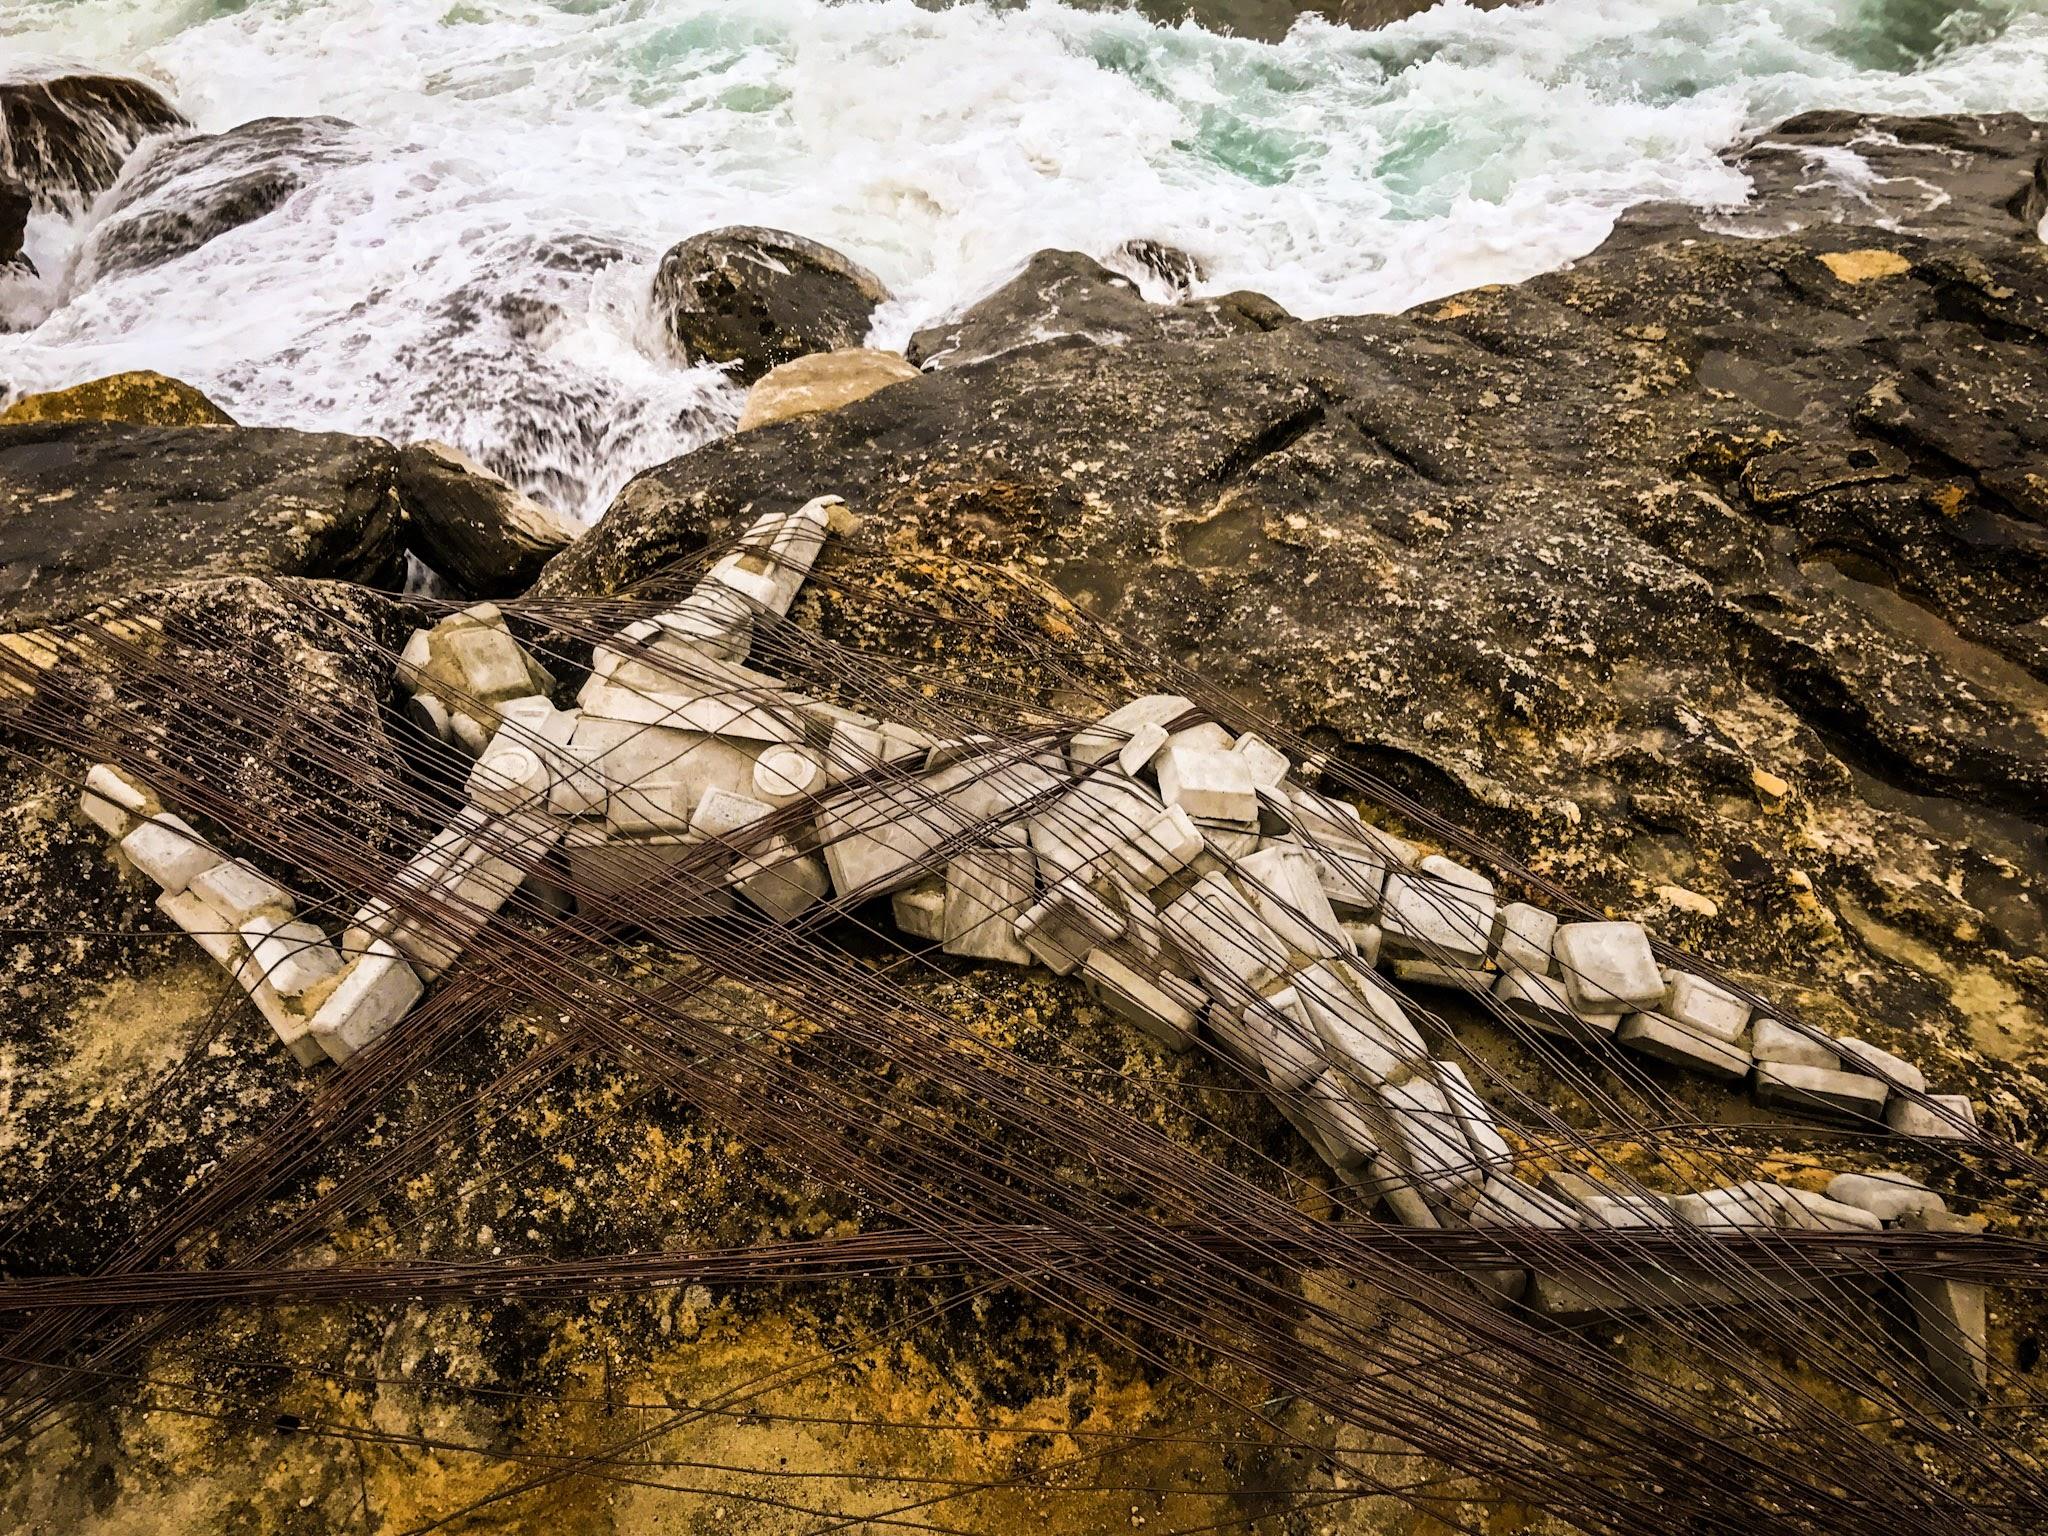 Sculptures by the Sea - Coastal Exhibition  Bondi to Tamarama Beach, Sydney